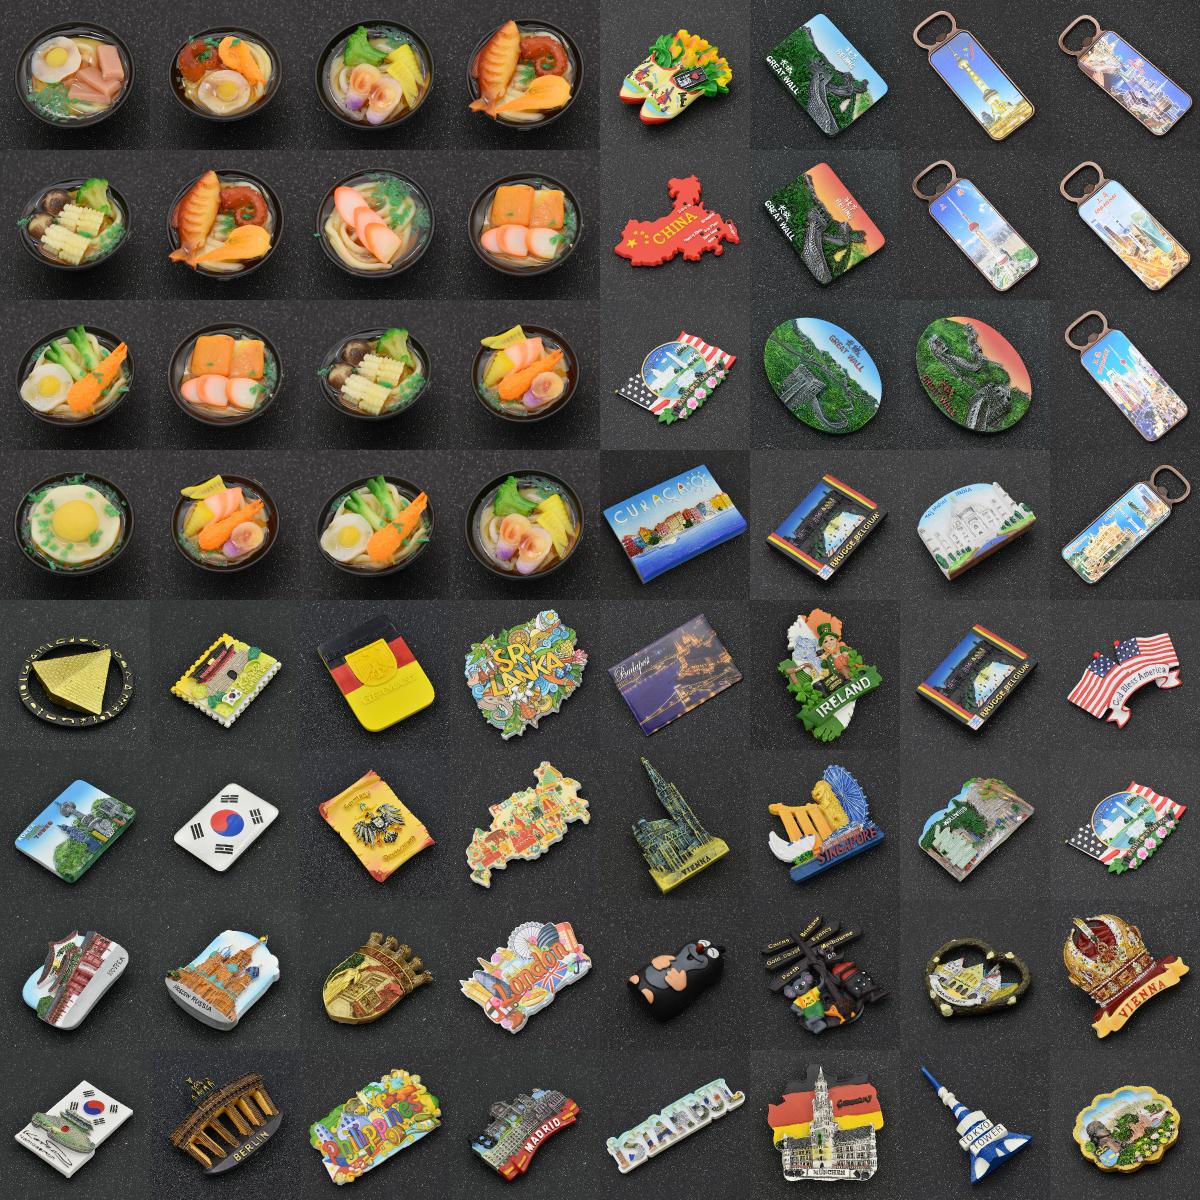 Kawaii Reise Andenken Kühlschrankmagnet Magnet Sticker UK US DE Kühlschrank Deko